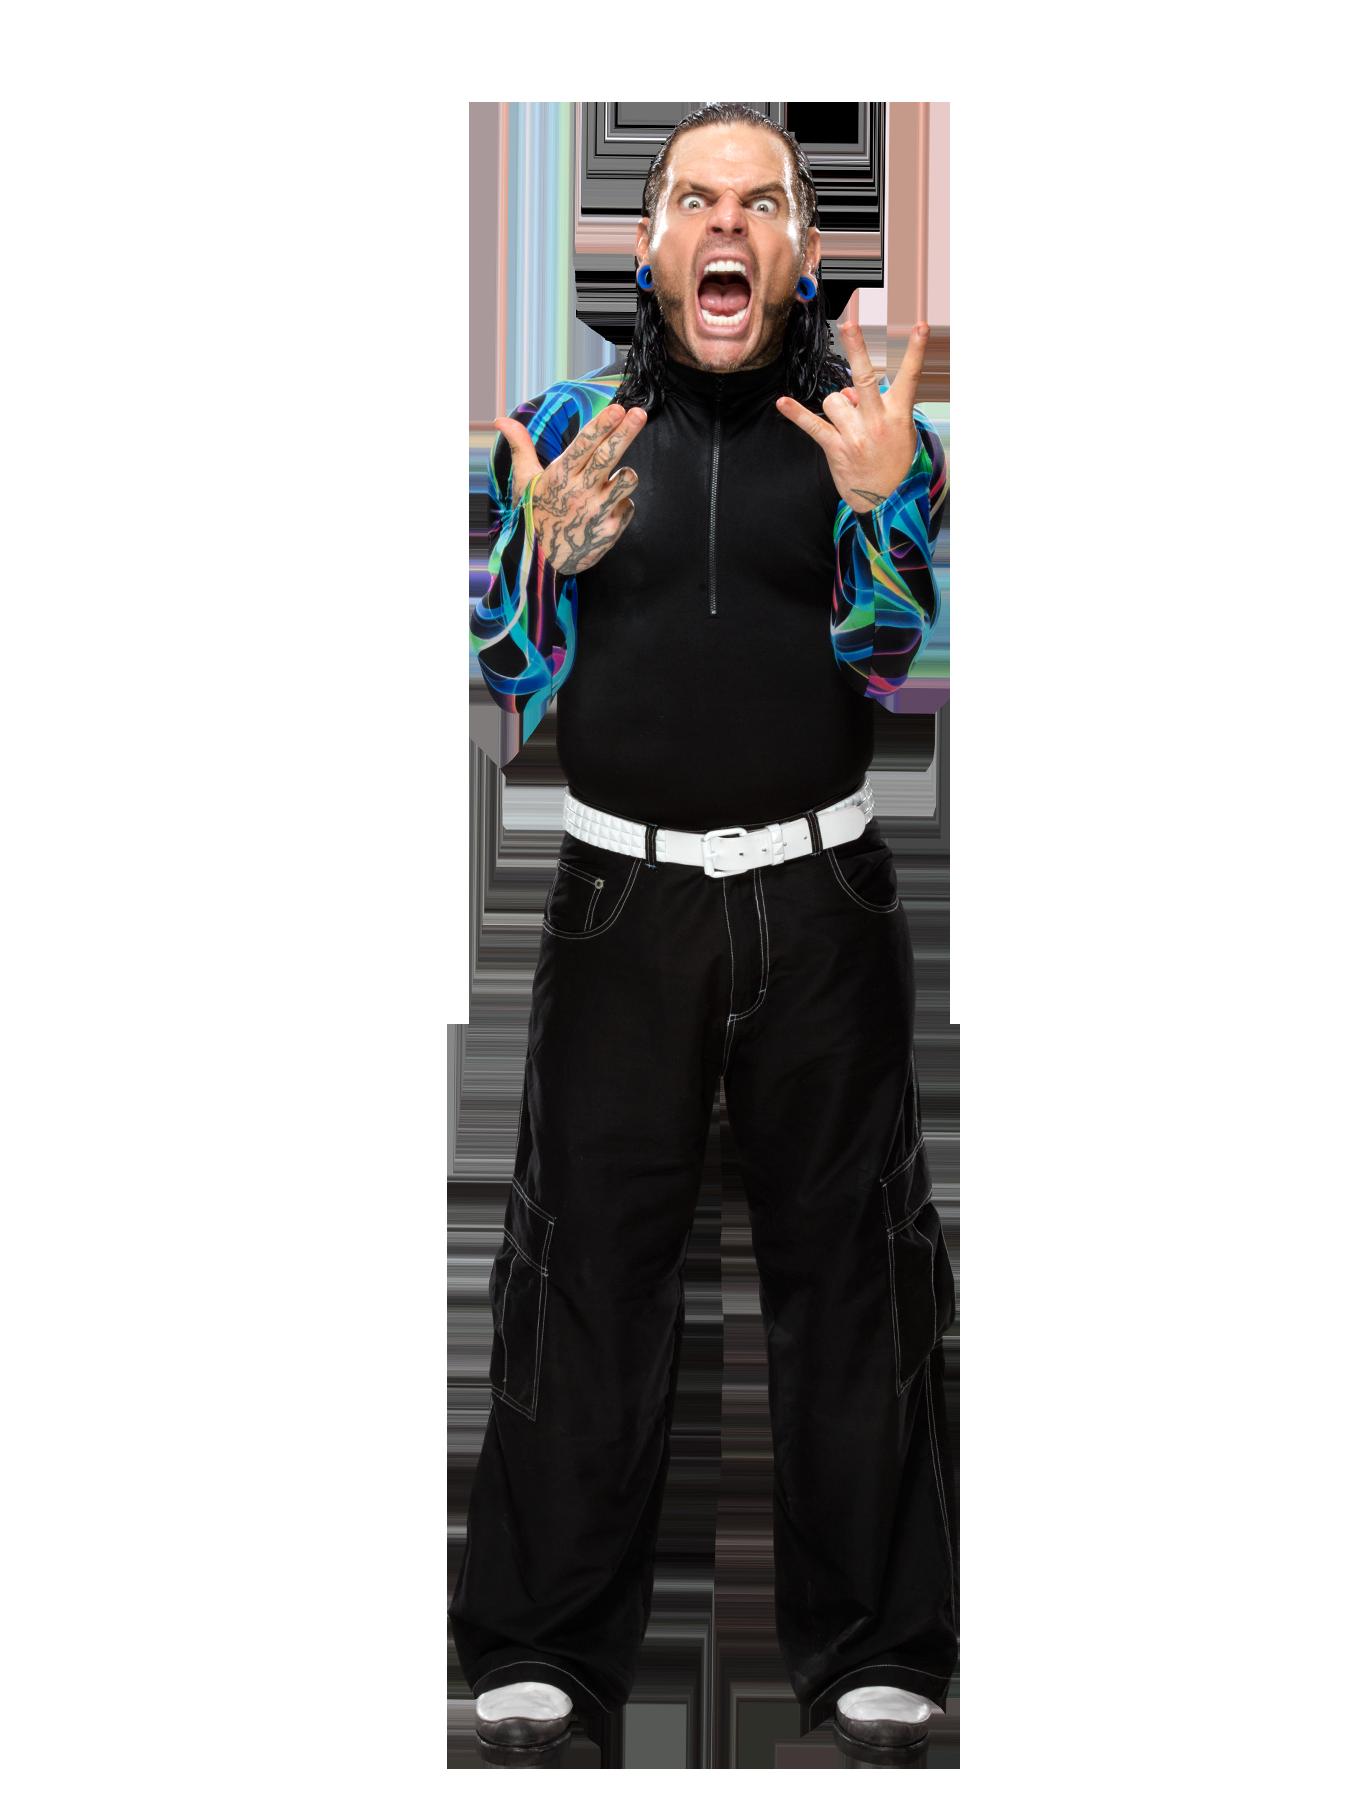 Image Jeff Hardy Wwe 2017 Png Pro Wrestling Fandom Powered By Wikia